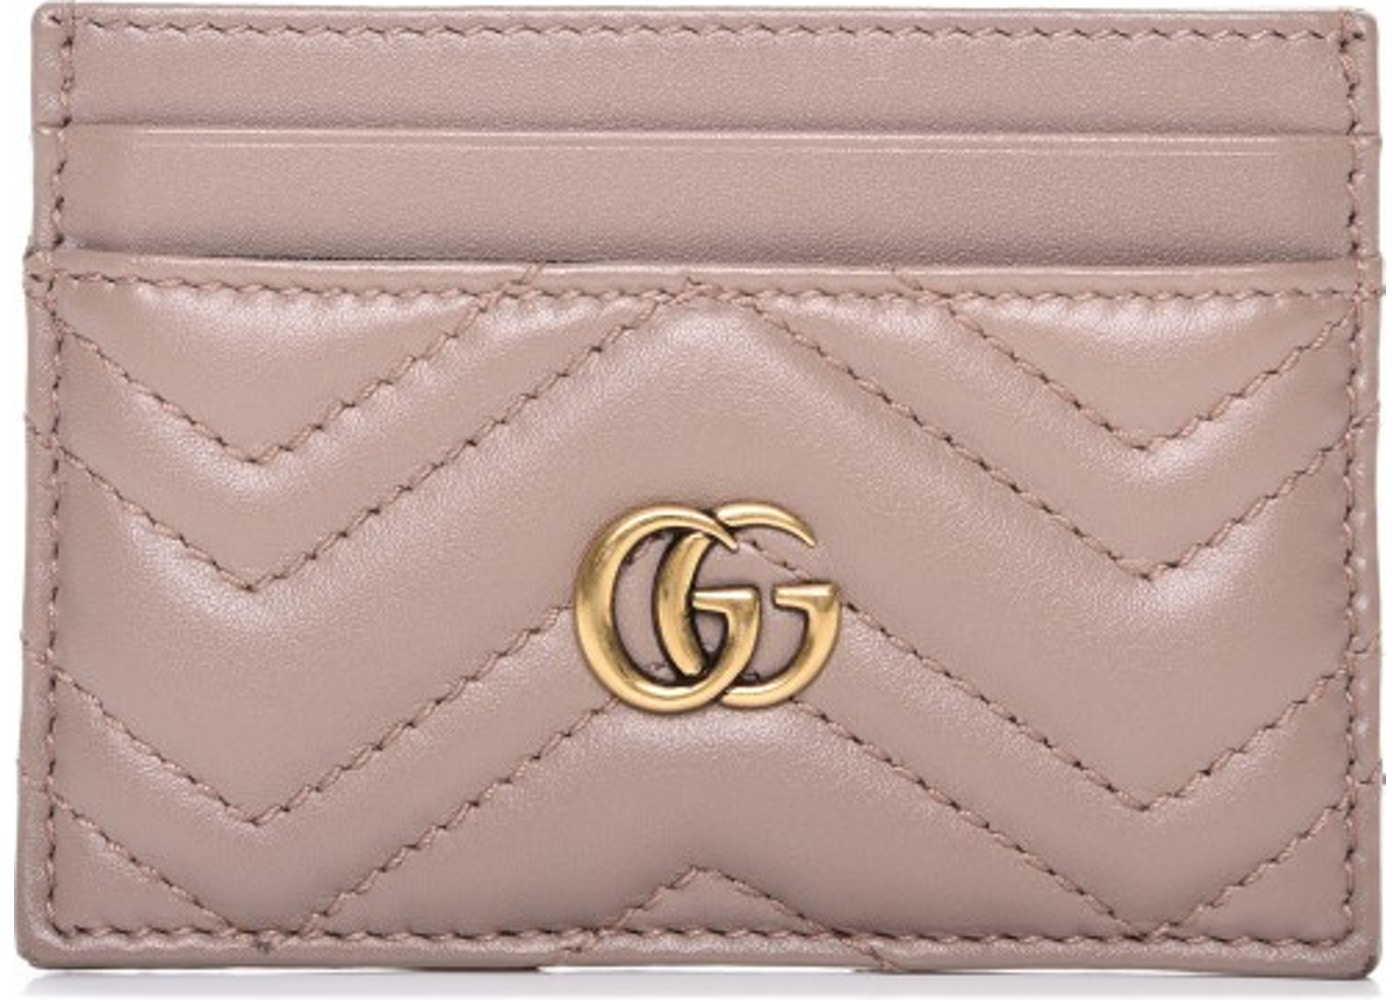 15d0b2105 Gucci Marmont Card Case Monogram Matelasse GG Dusty Pink. Monogram  Matelasse GG Dusty Pink